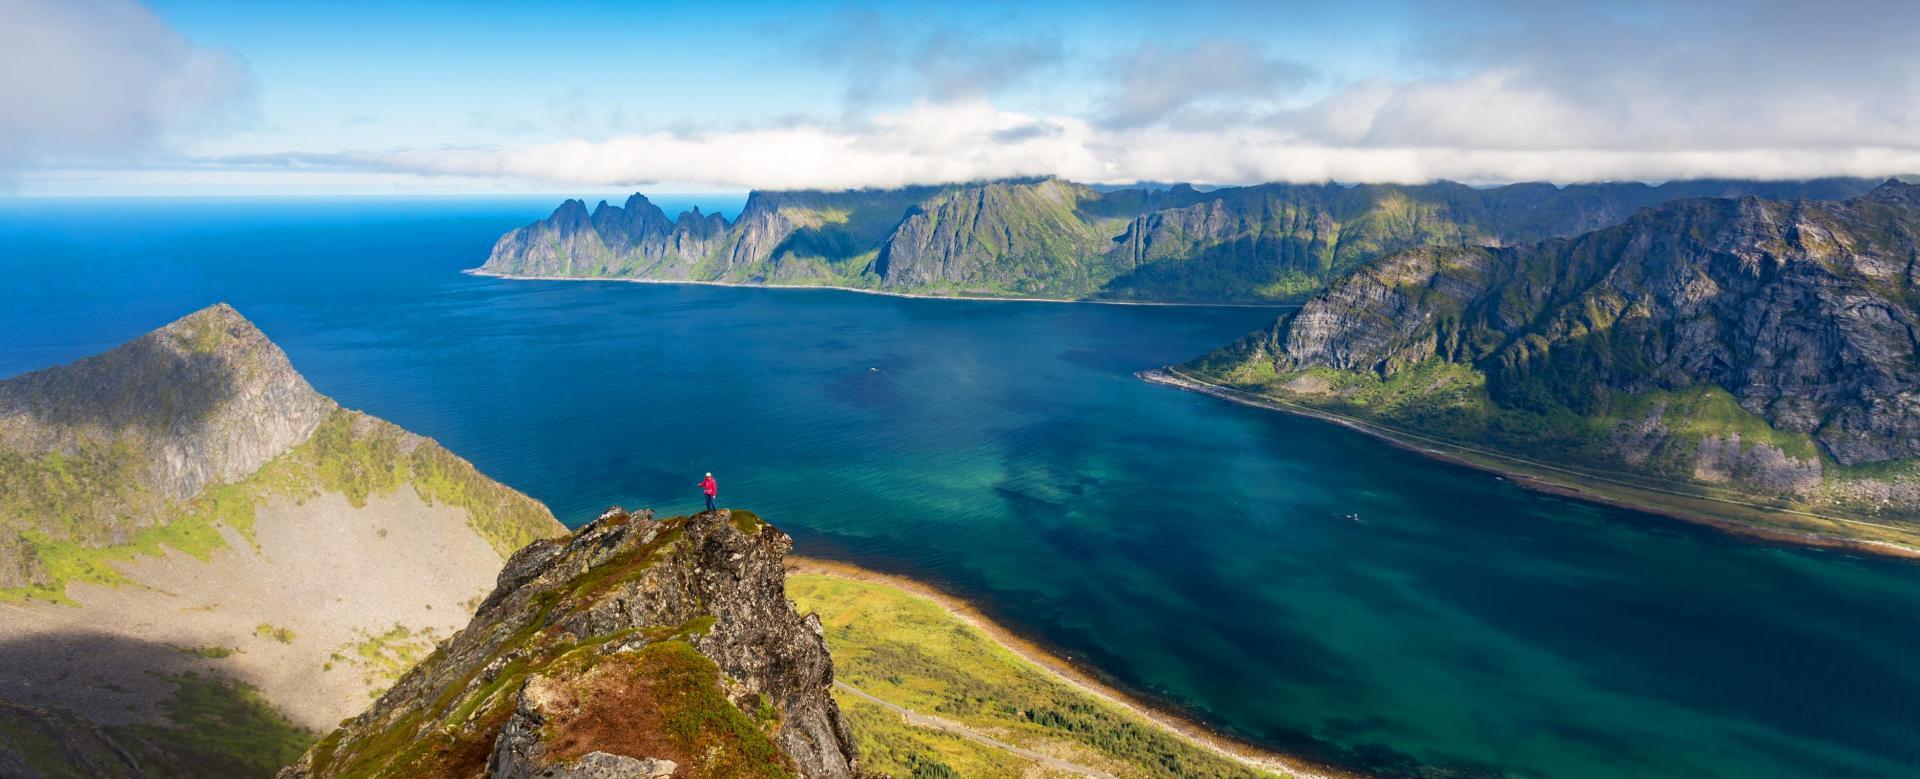 Voyage à pied : Norvège : Trek sur senja, kvaløya et alpes de lyngen